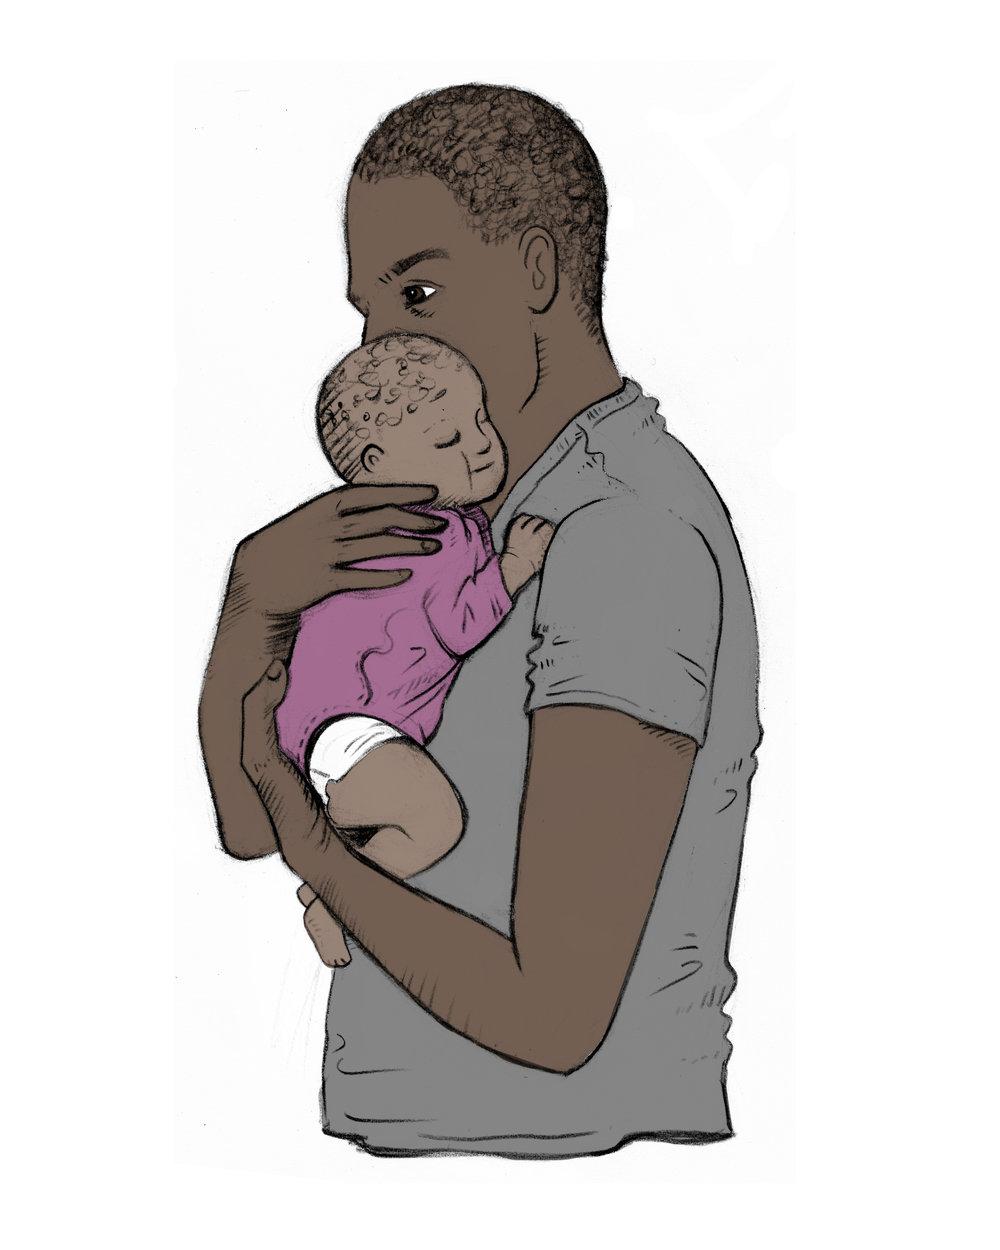 FASD_AWARENESS_ILLUSTRATIONS-FATHER_WITH_NEWBORN.jpg